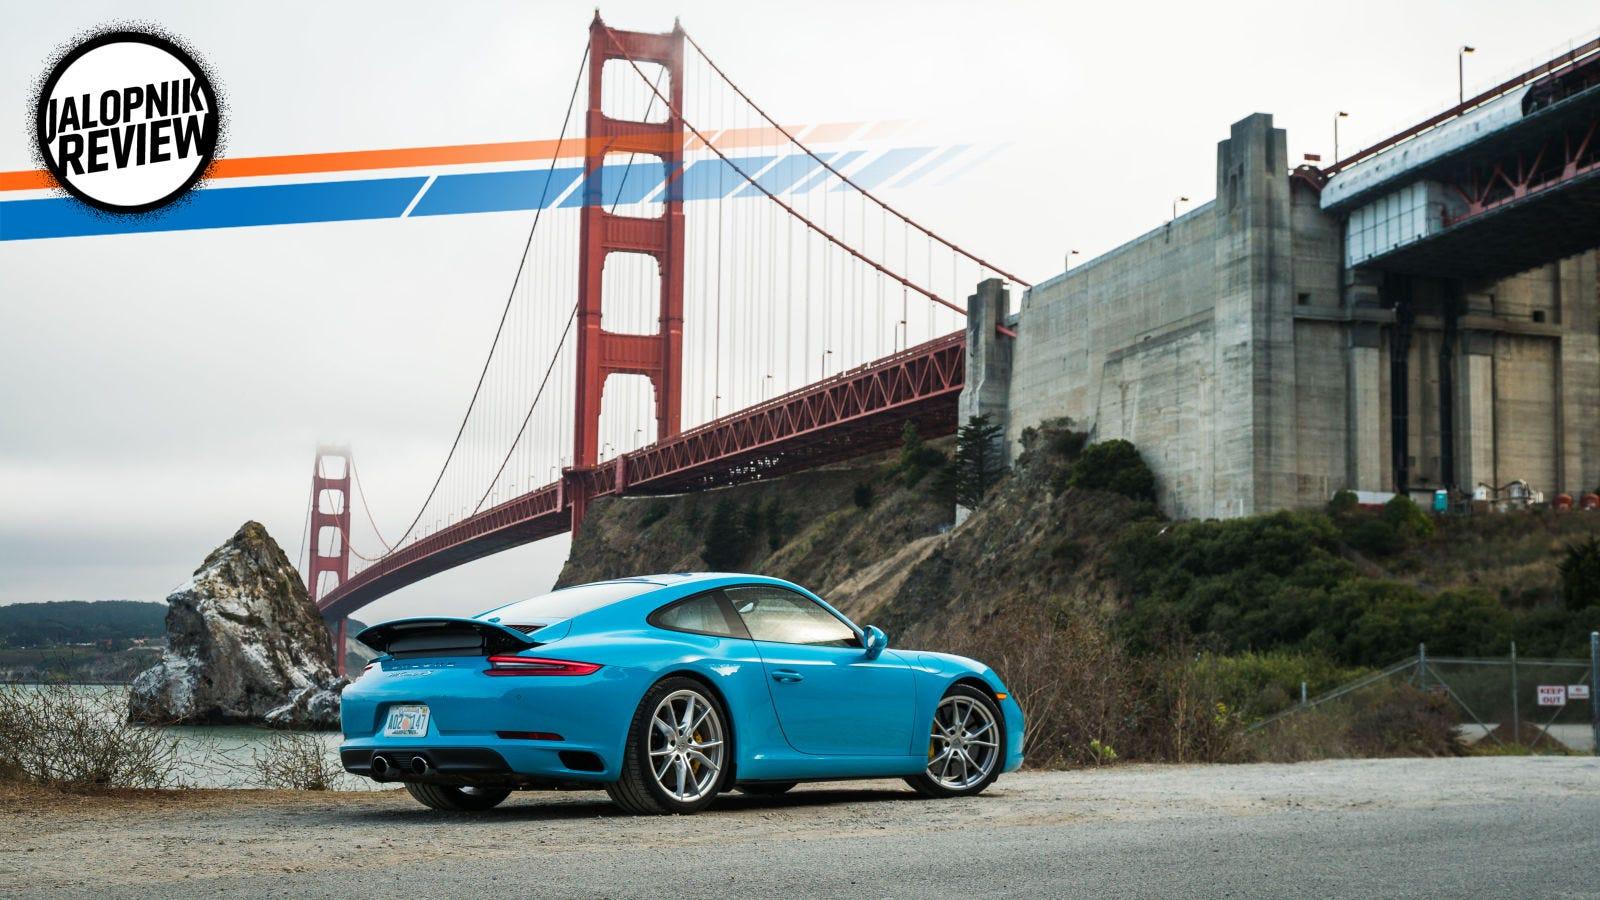 The 2017 Porsche 911 Carrera S Turbos Arent For Crazy